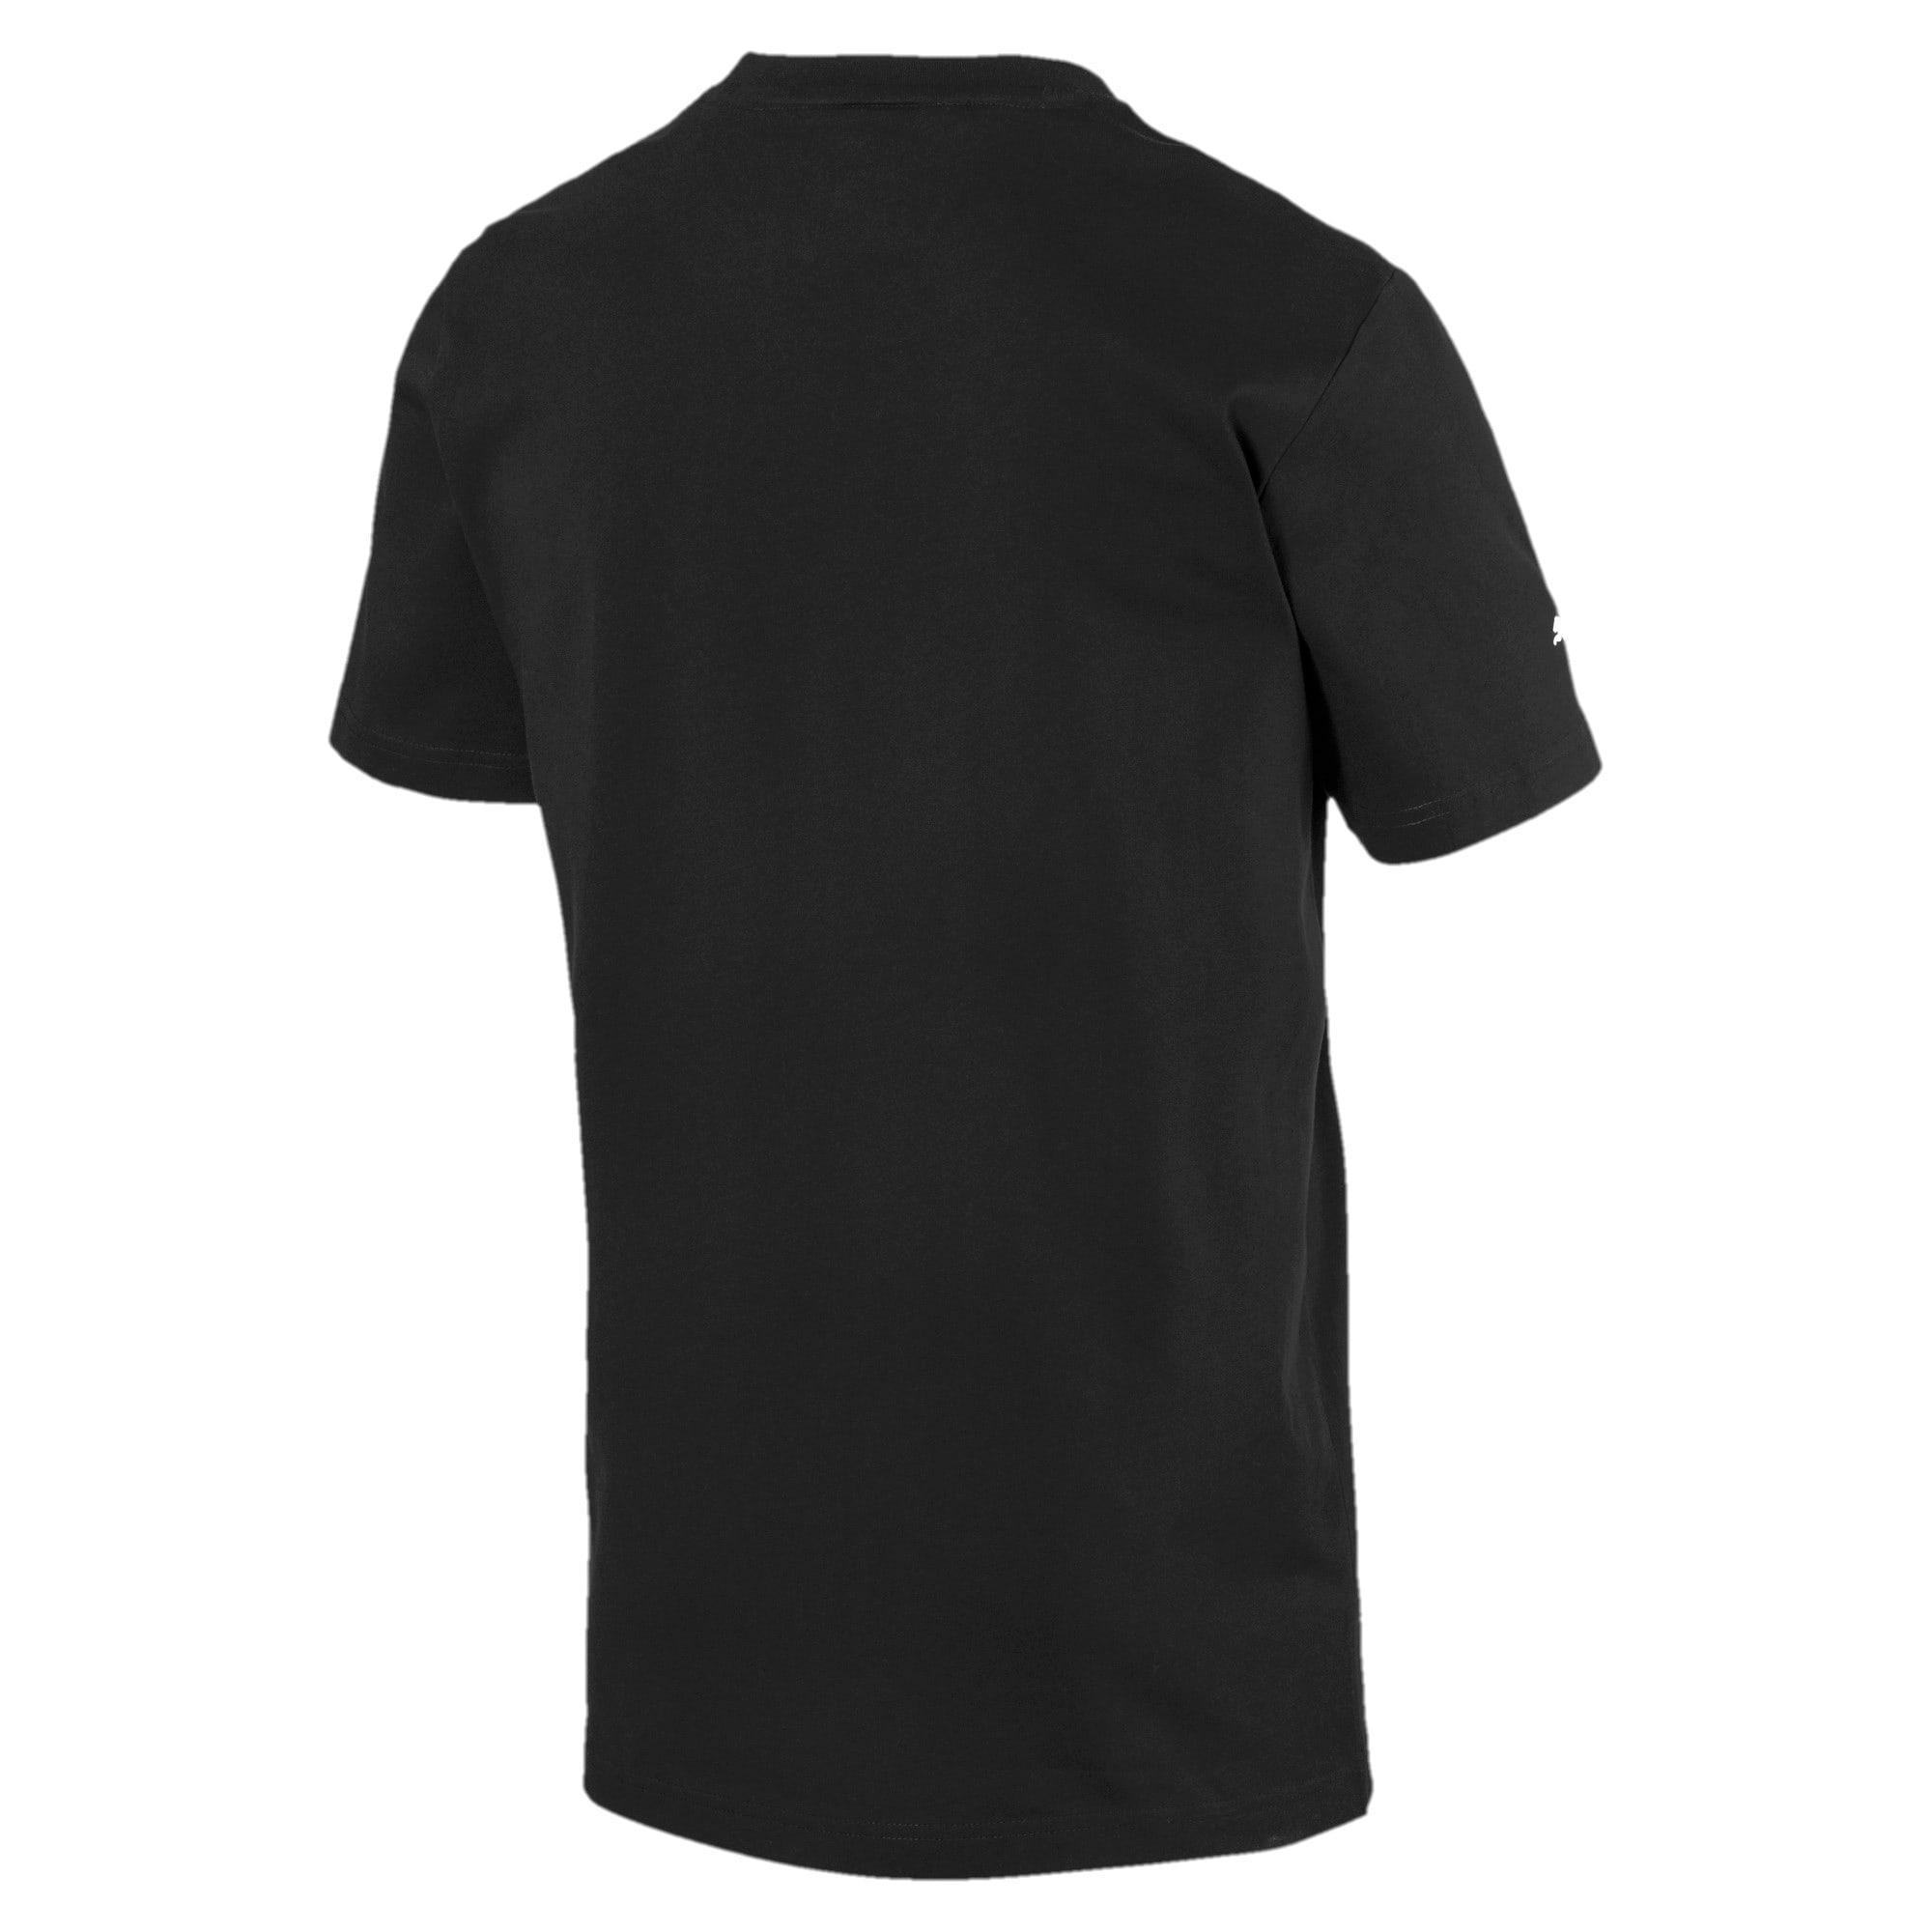 Thumbnail 5 of T-shirt con logo BMW M Motorsport uomo, Puma Black, medium